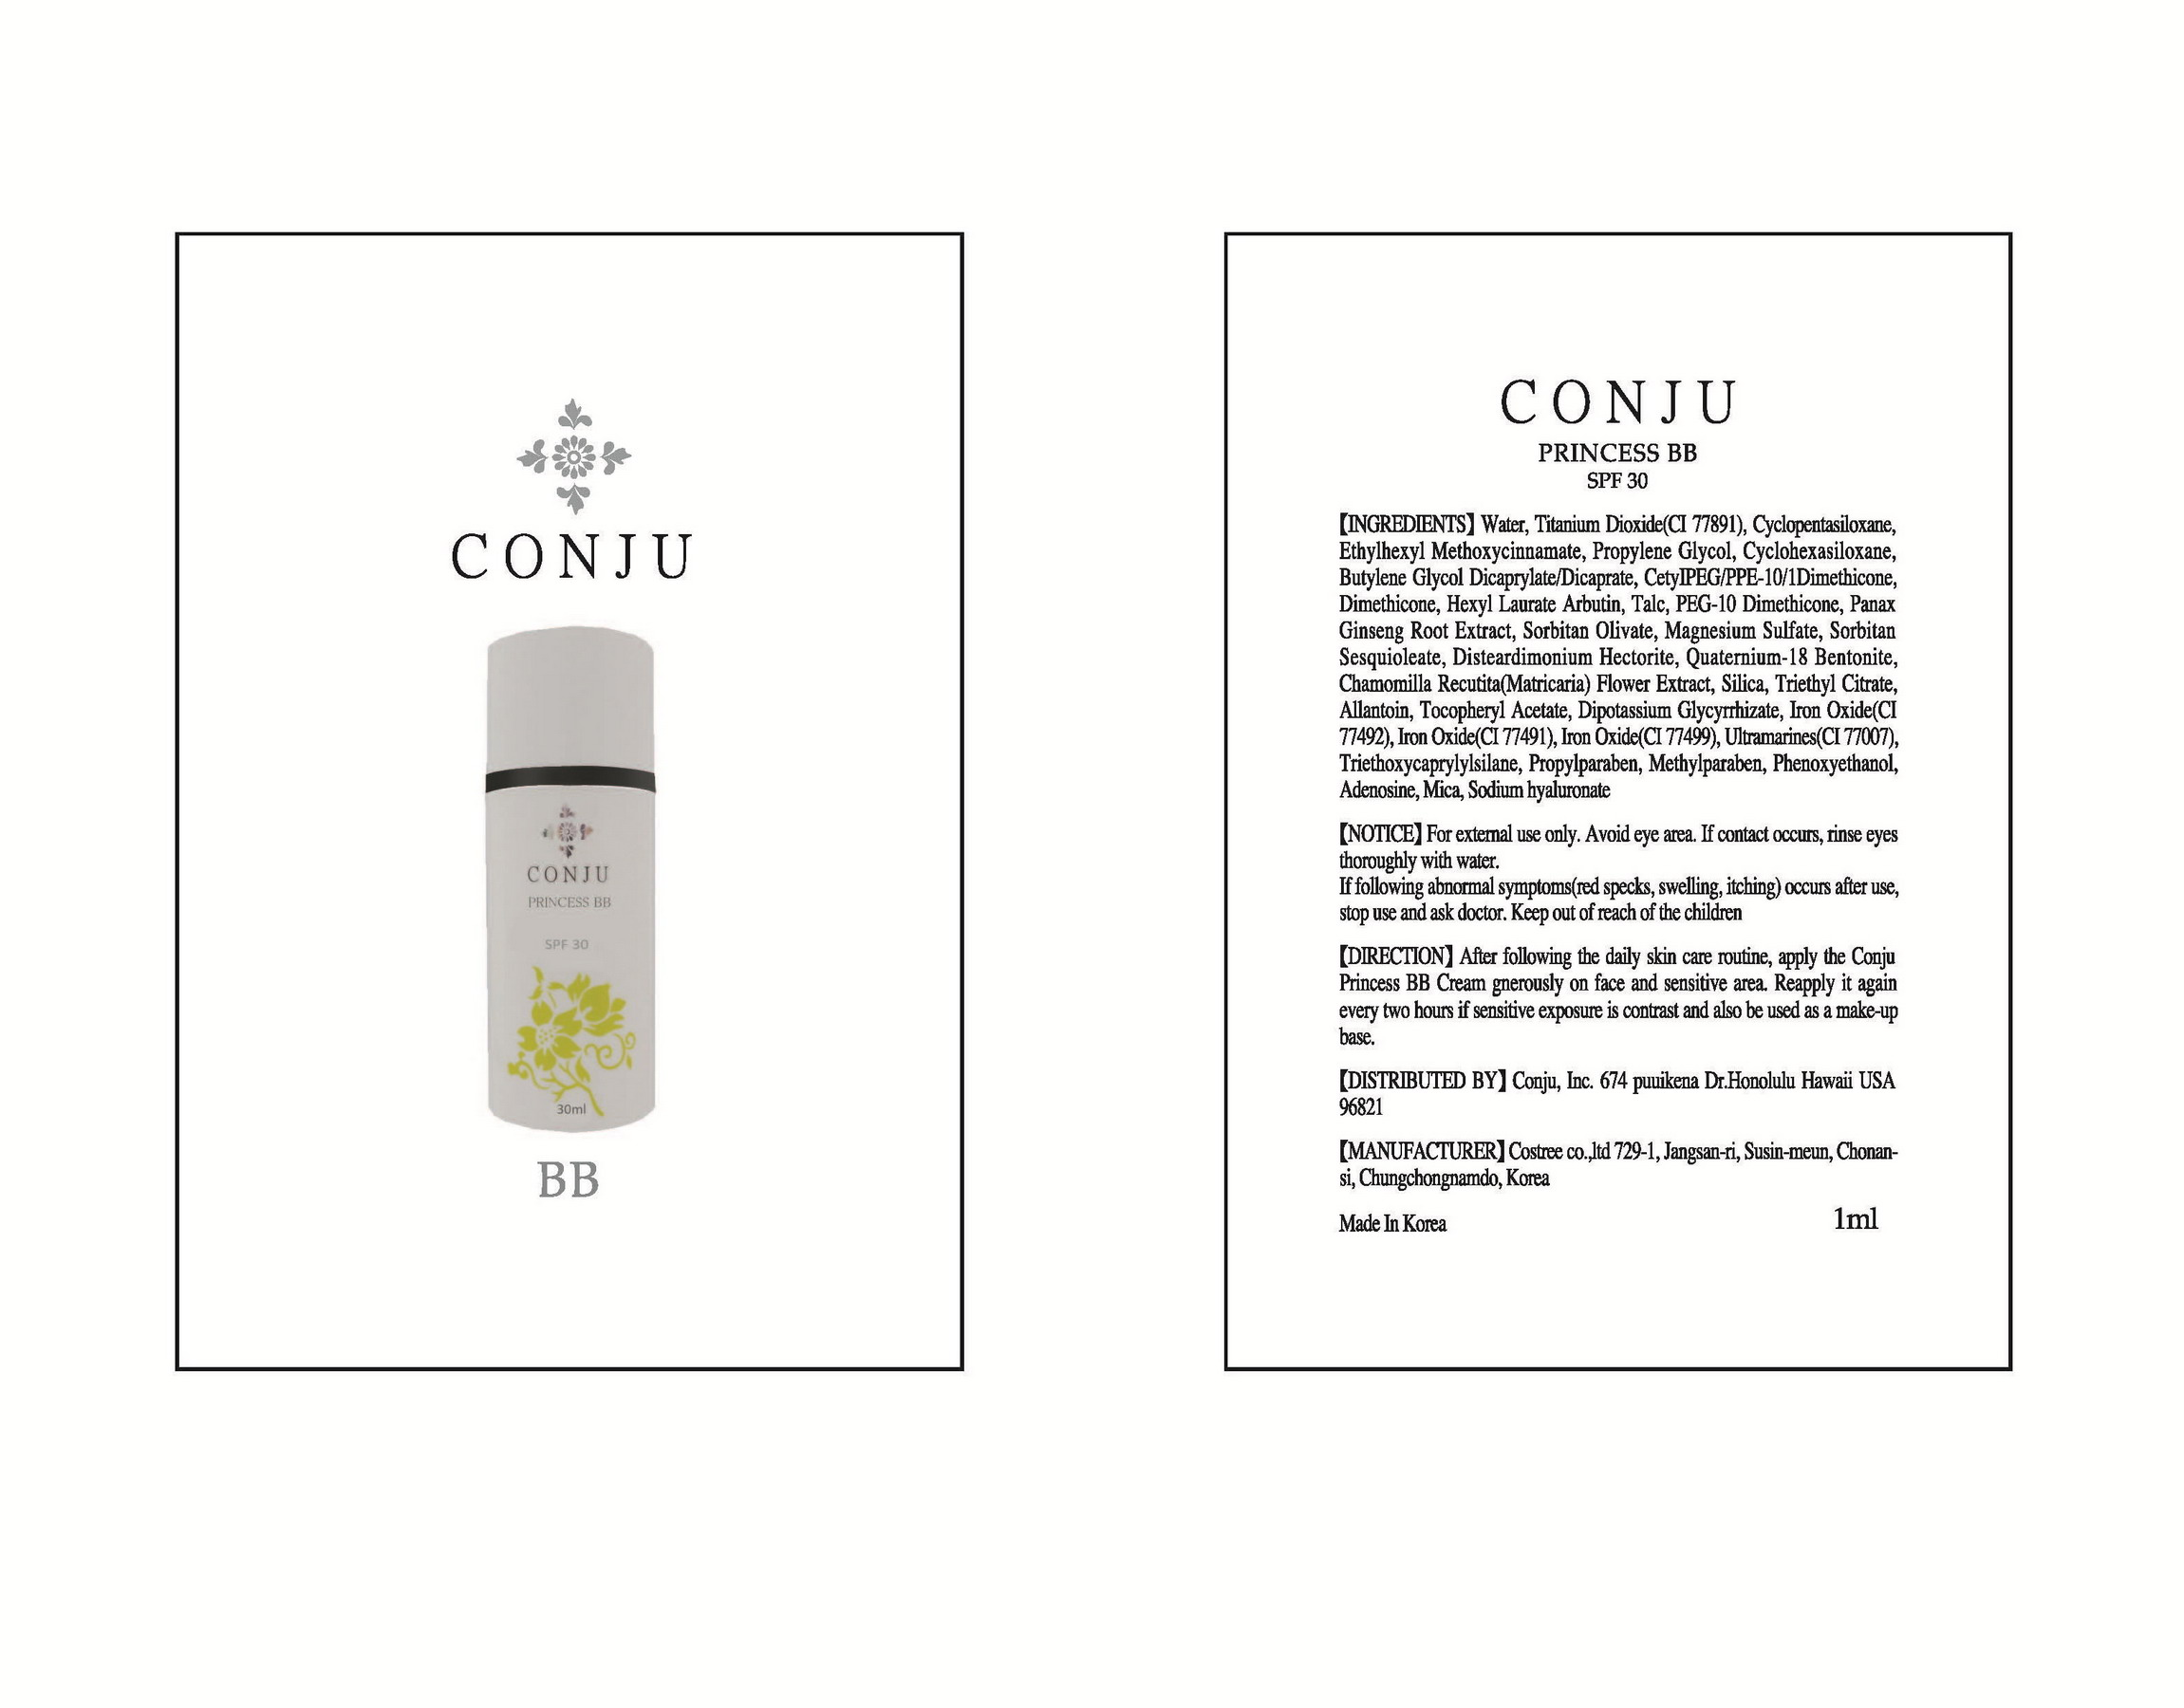 Conju Princess Bb (Arbutin) Cream [Conju Inc]